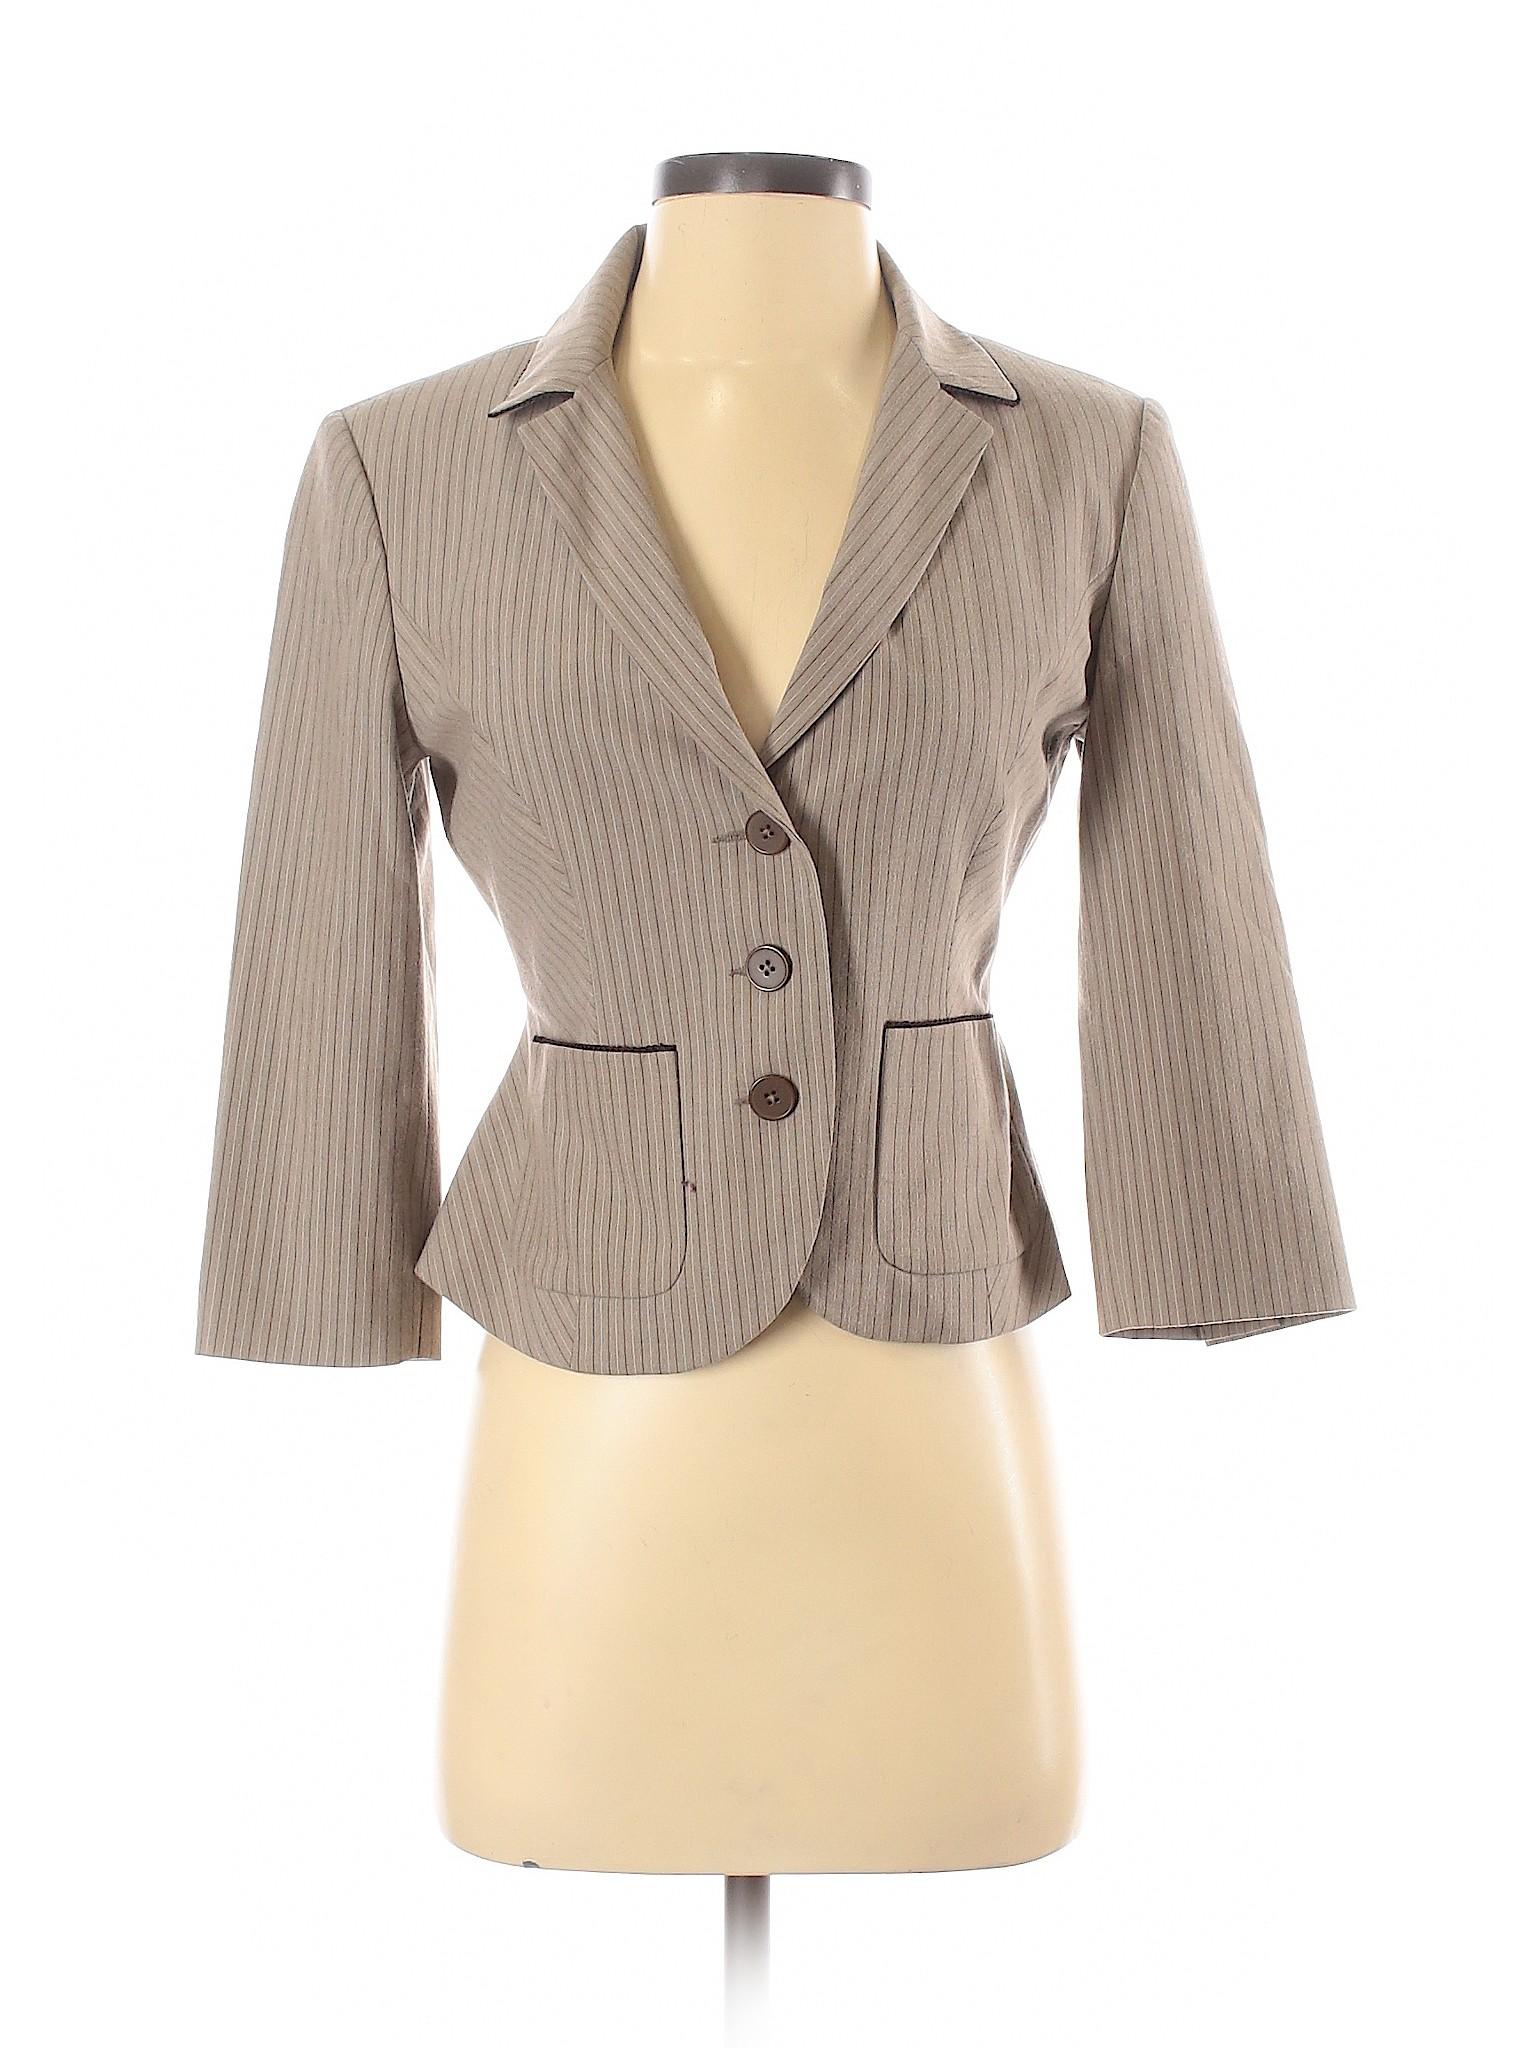 Express Design Studio De Mujer Blazer 2 Marron Ebay